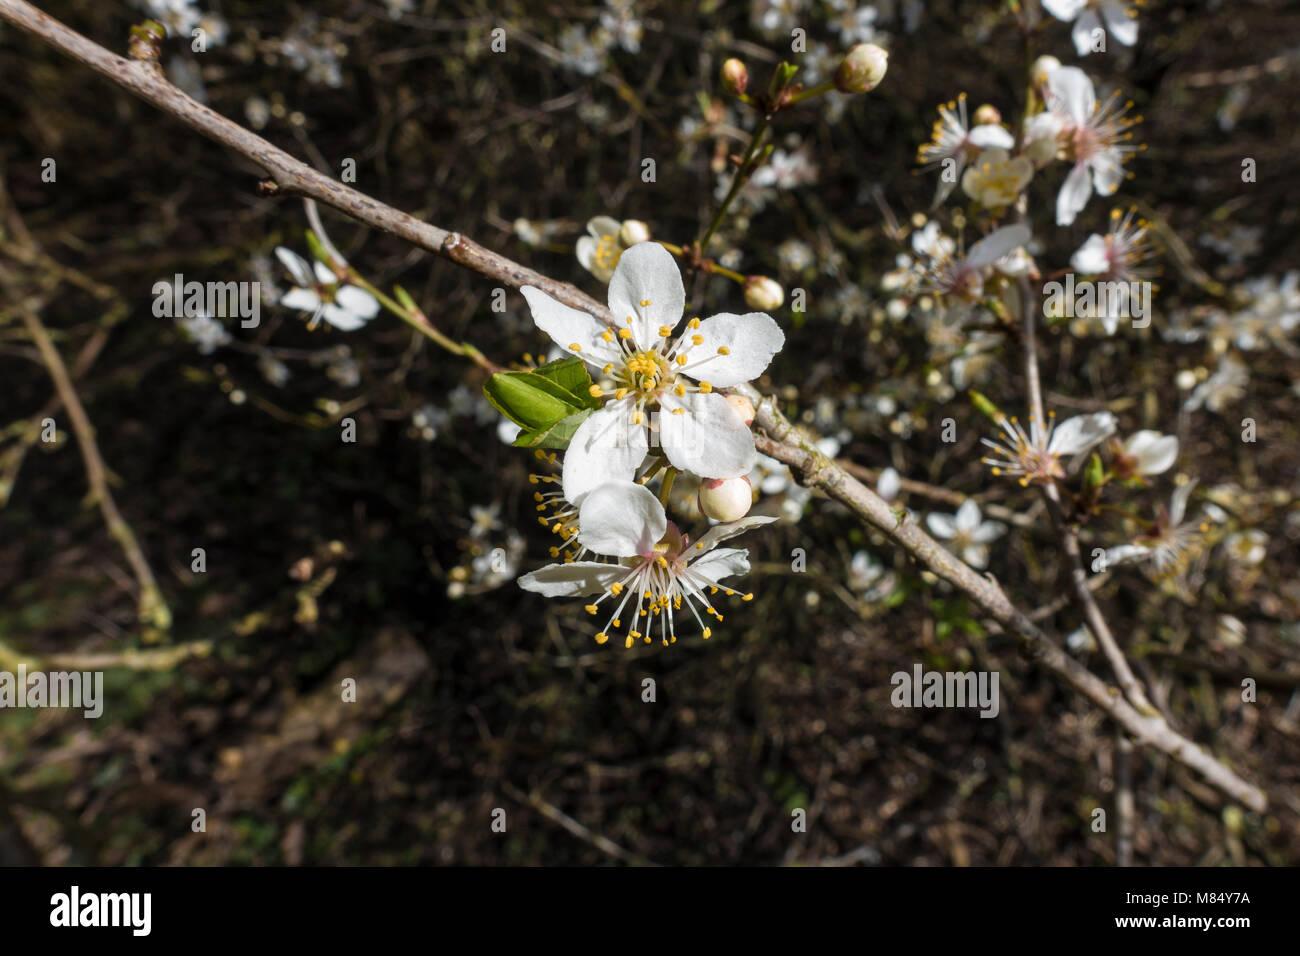 tree-blossom-flower-M84Y7A.jpg